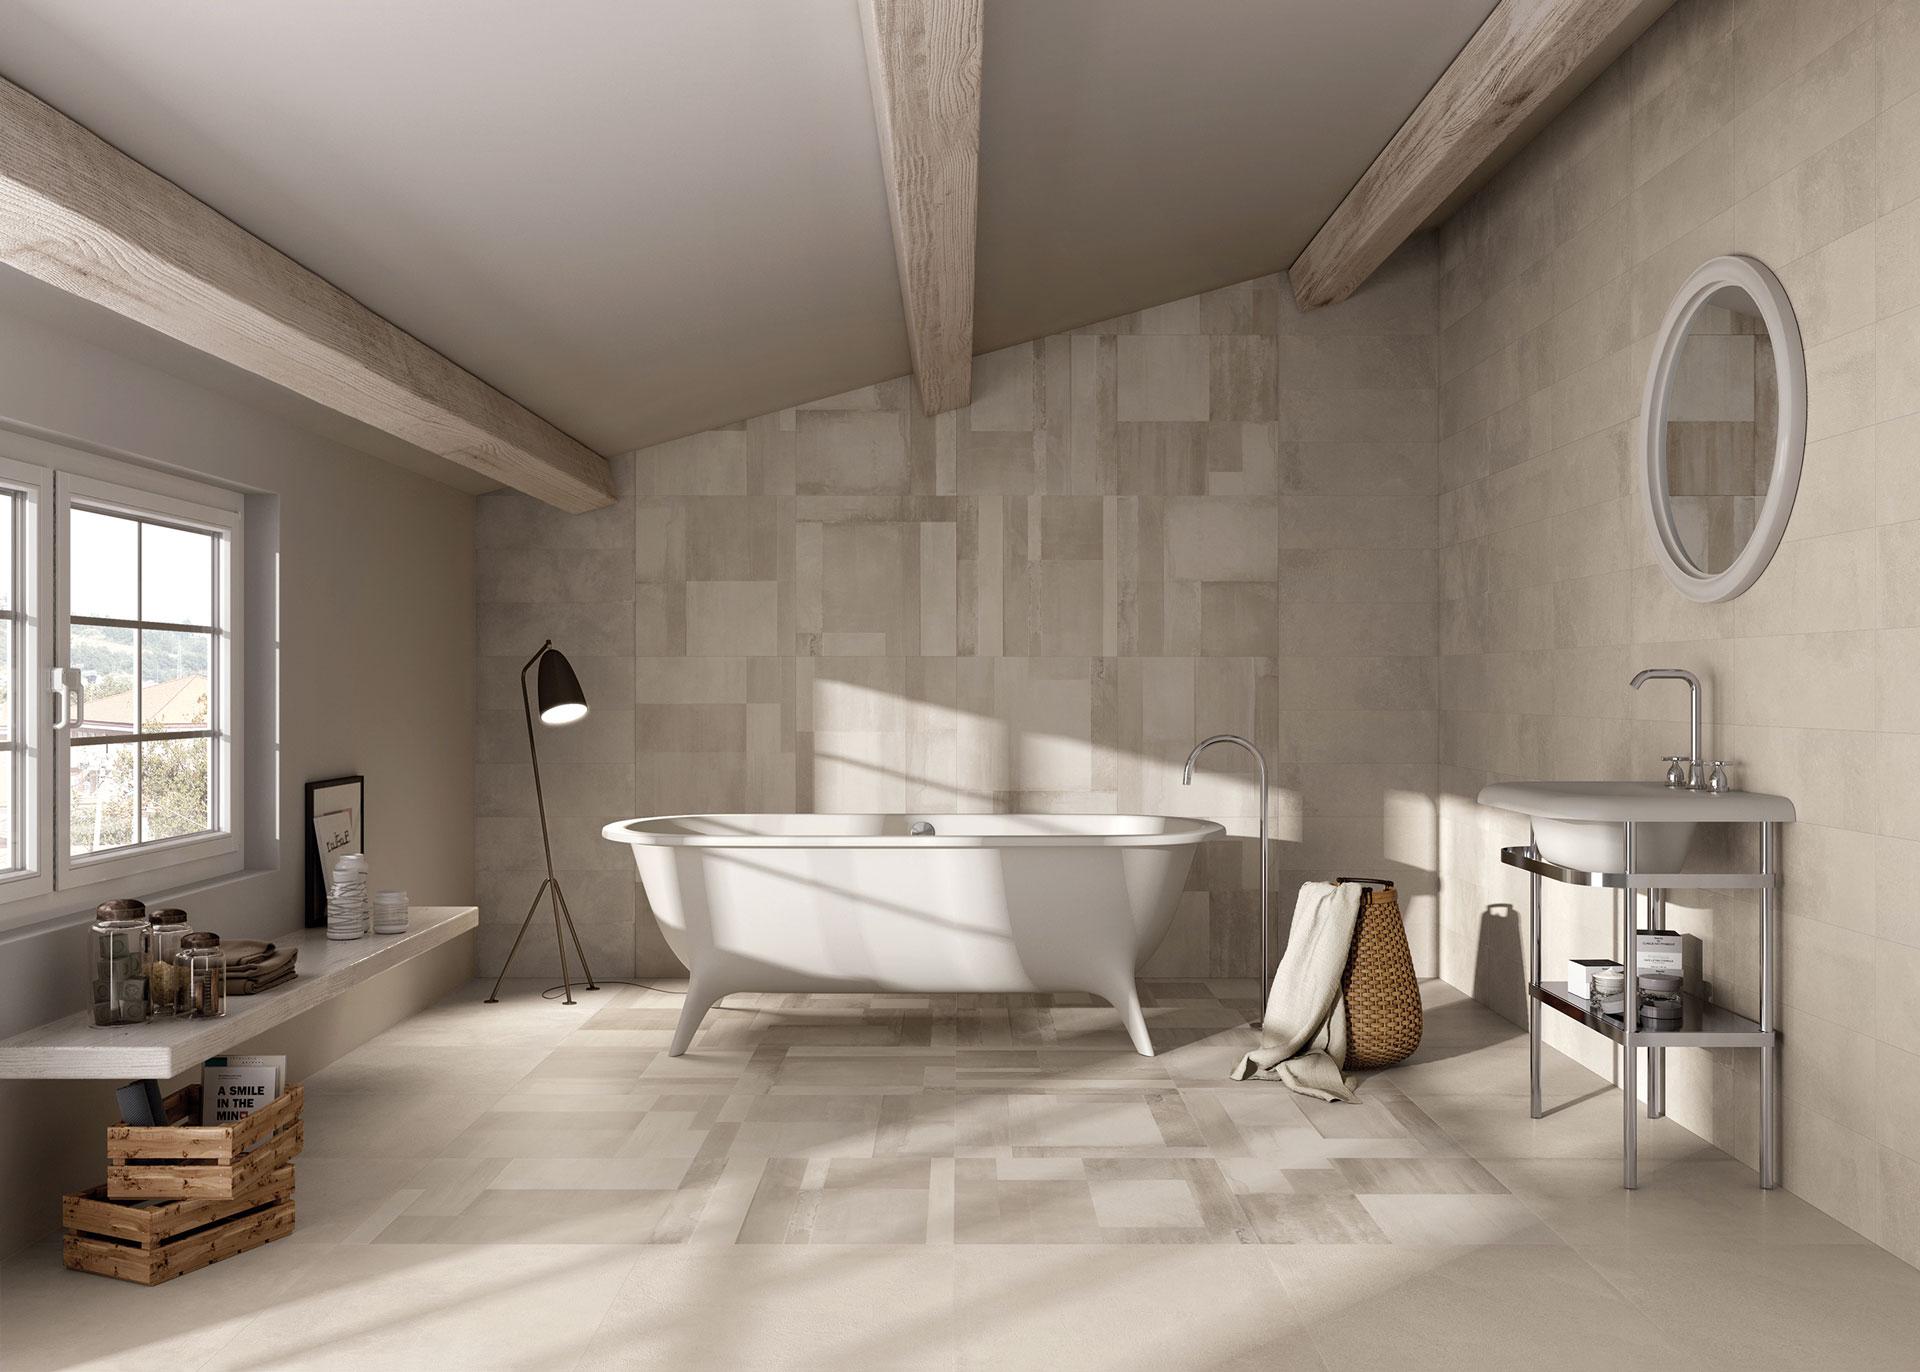 Salle de bain quaiducarrelage rixheim mulhouse for Salle de bain carrelage colore